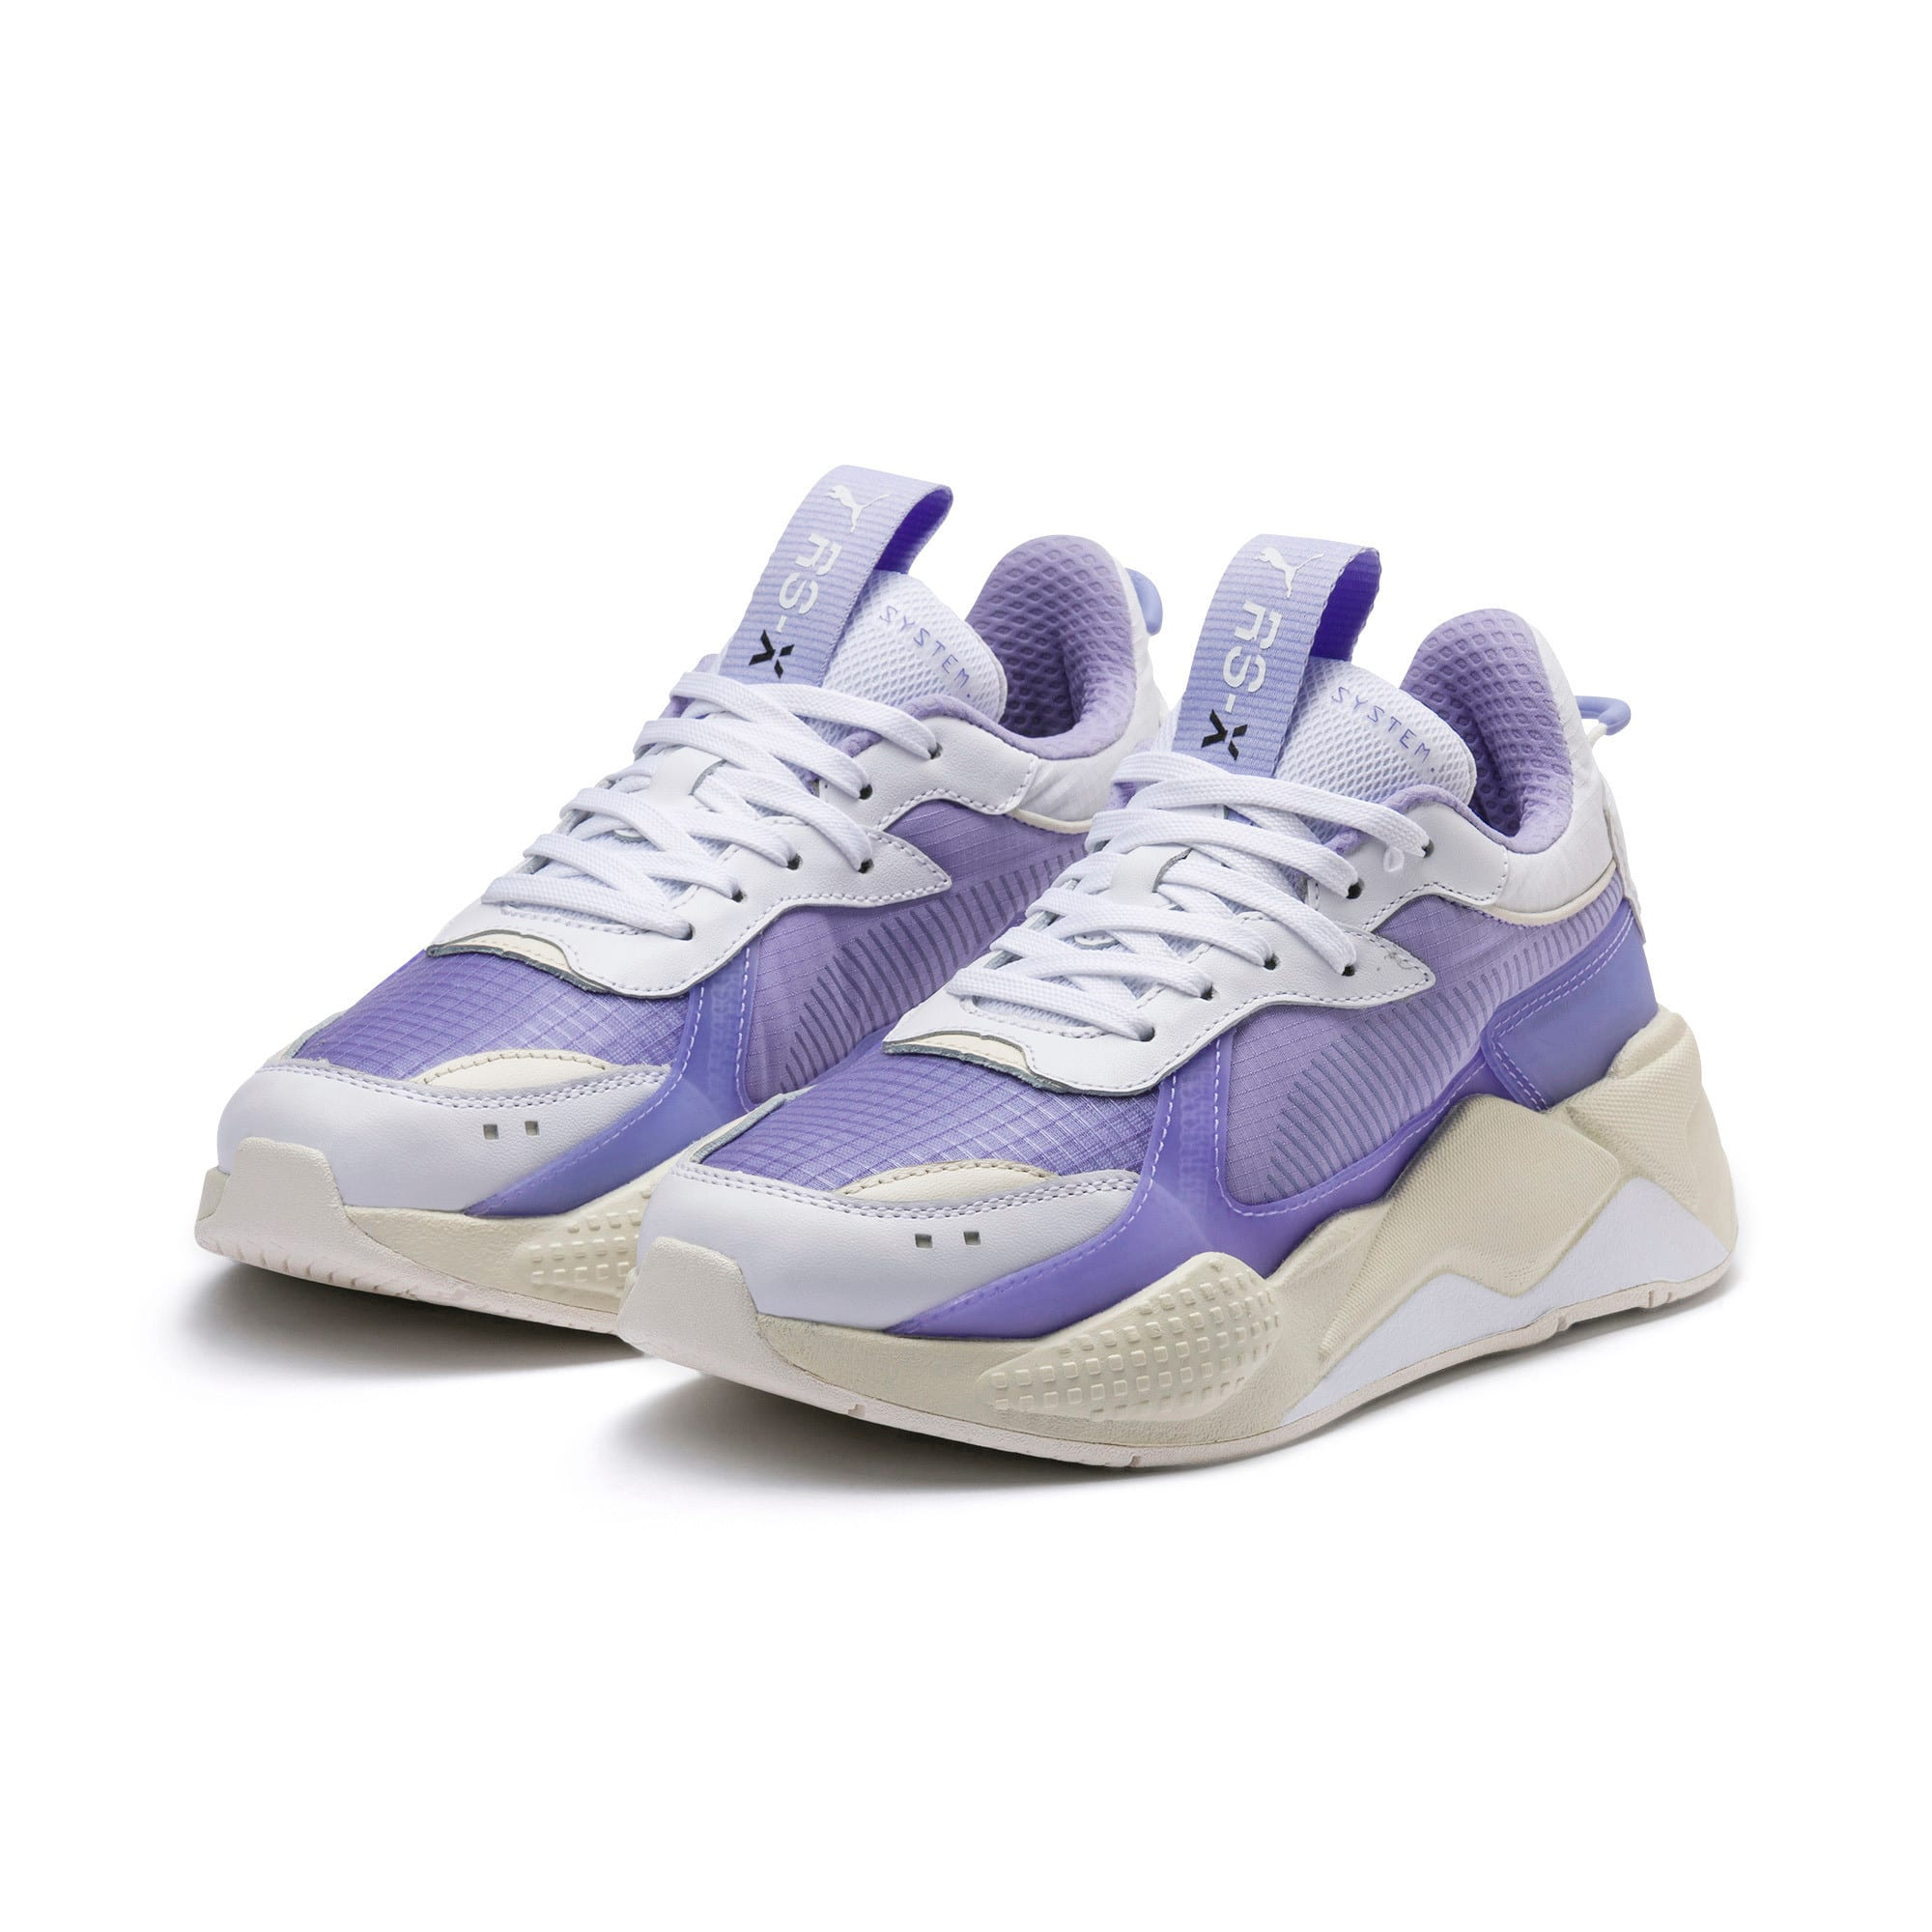 Thumbnail 2 of Basket RS-X Tech, Puma White-Sweet Lavender, medium